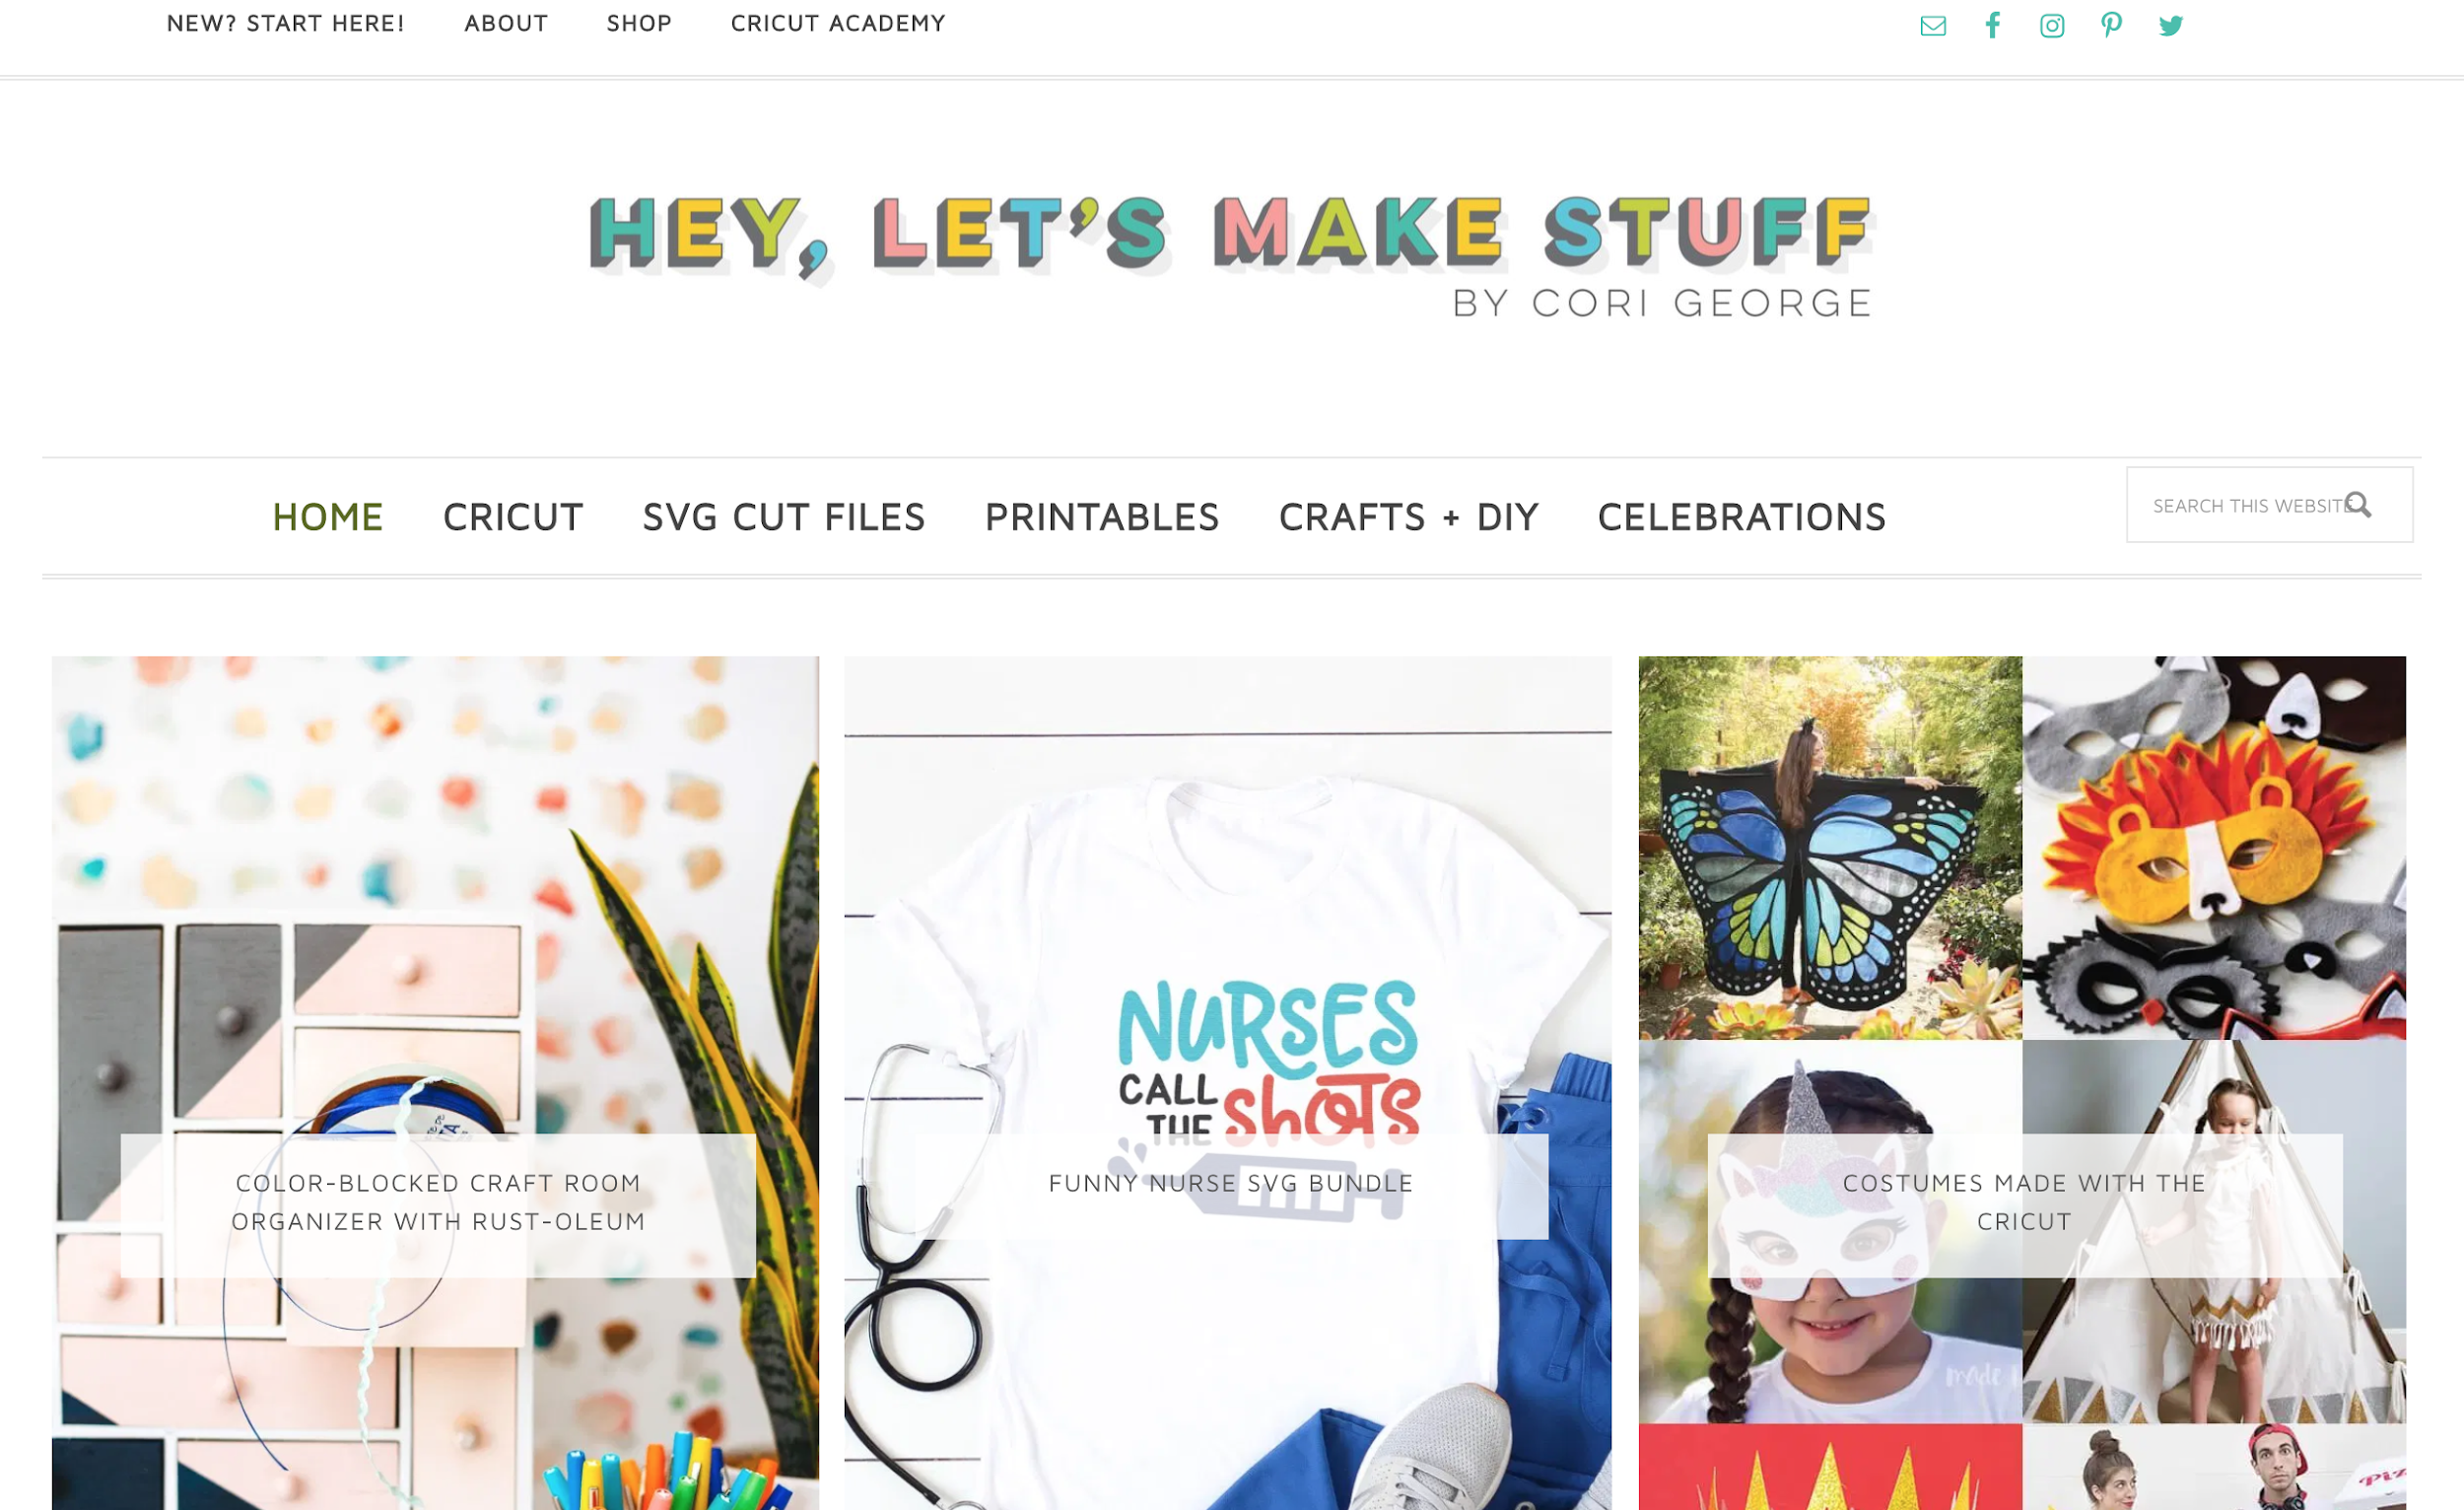 monetizing blog shop example hey let's make stuff